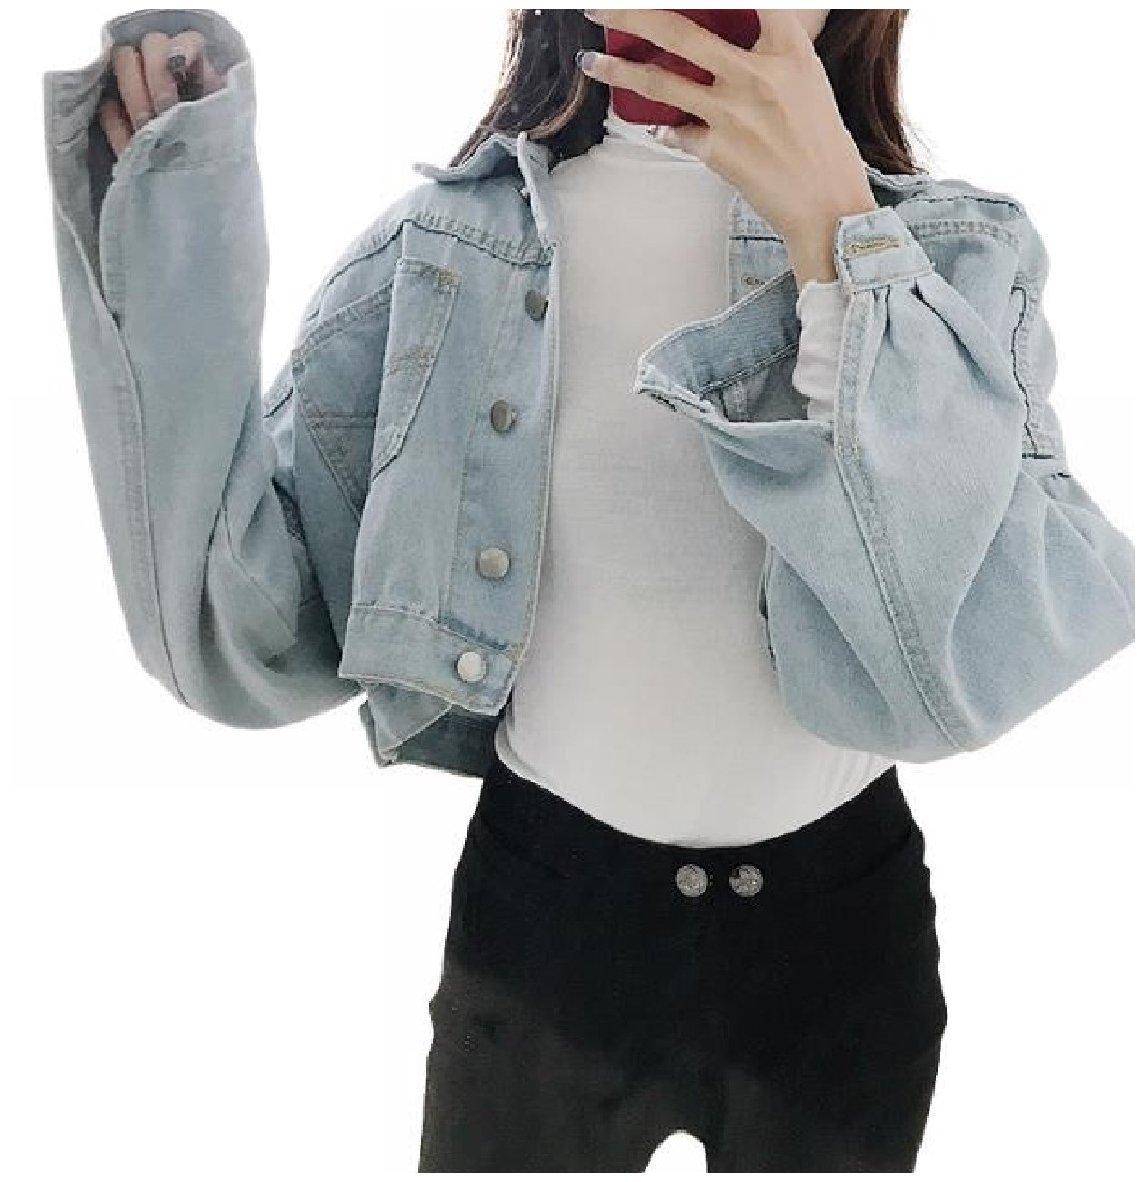 Zimaes-Women Lapel Collar Short Style Baggy Denim Jean Jacket Coats Outerwear Light Blue OS